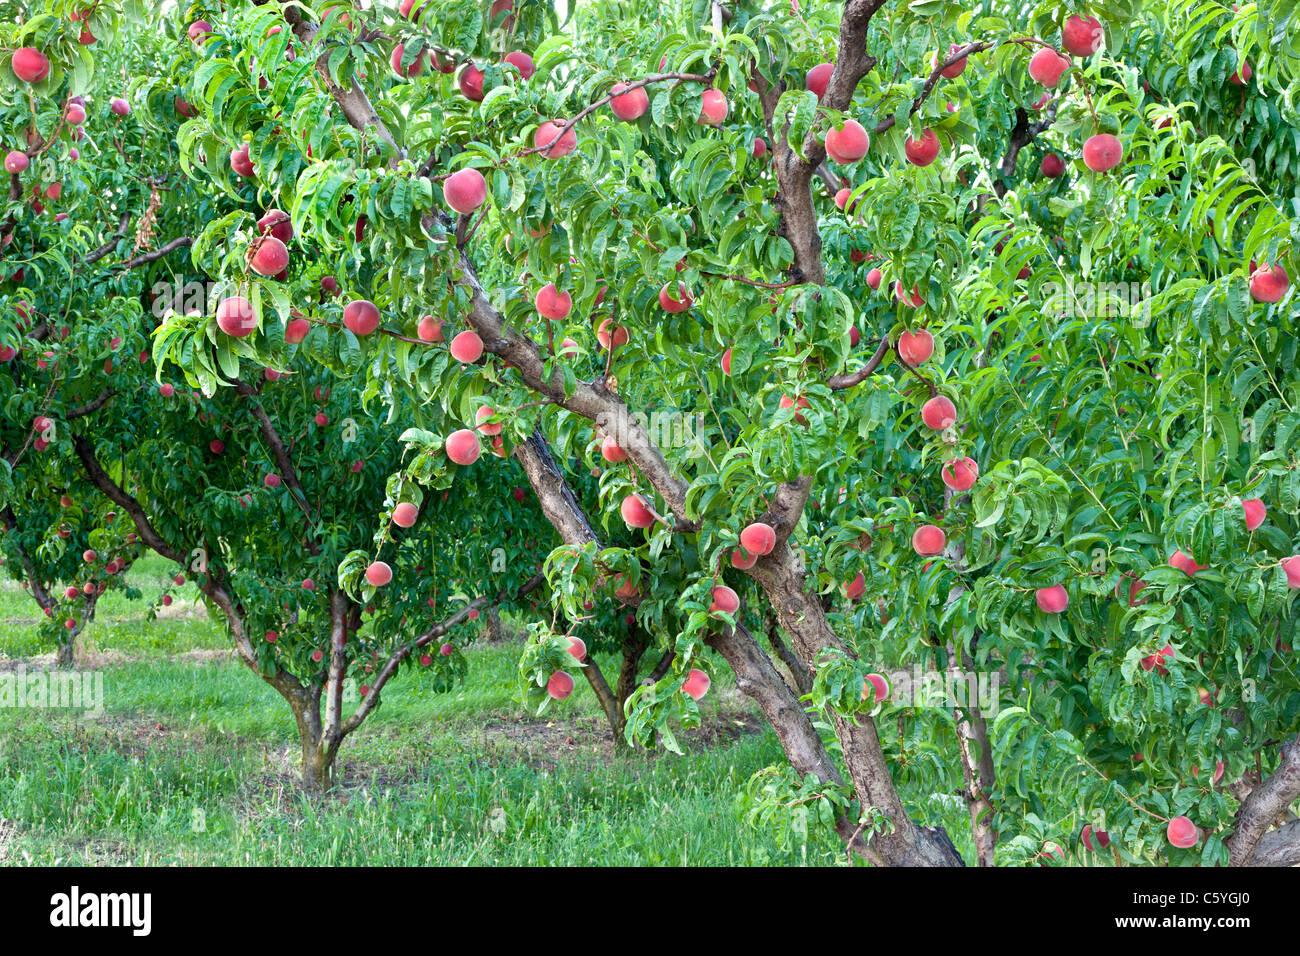 Peach tree bearing fruit 'White Lady Stock Photo, Royalty Free Image: 38099768 - Alamy